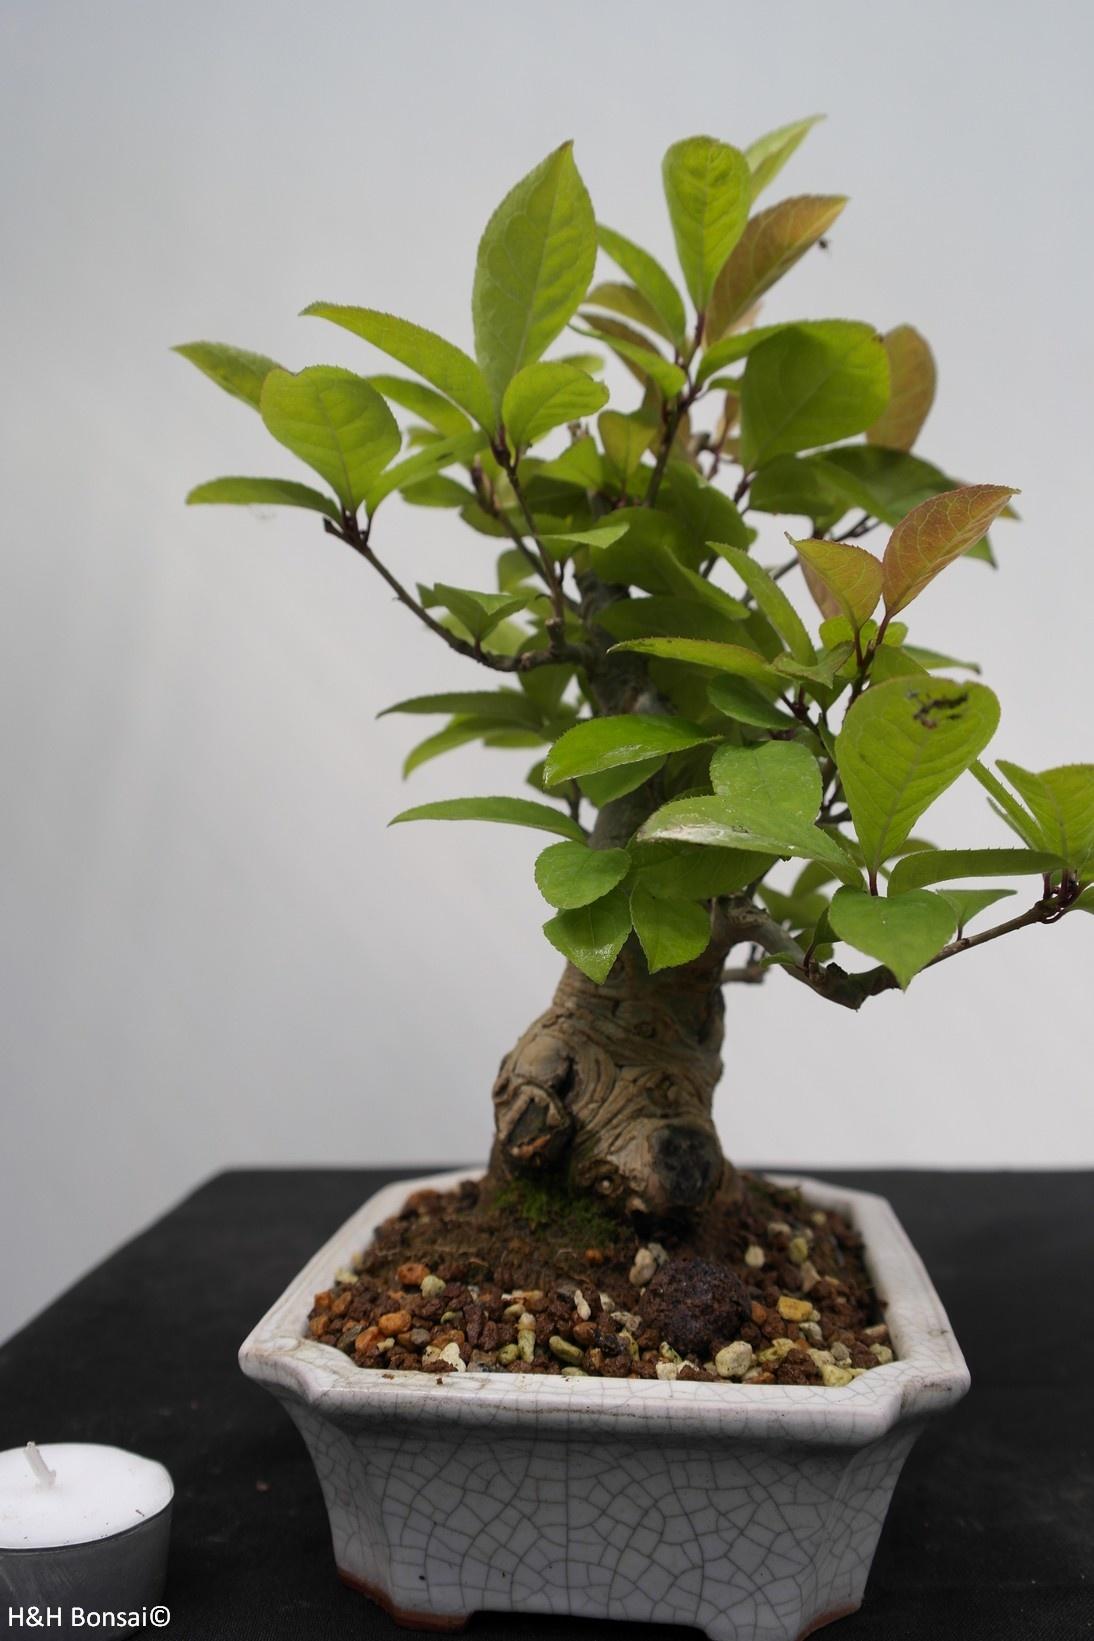 Bonsai Shohin Jap. Winterbeere, Ilex serrata, nr. 7781